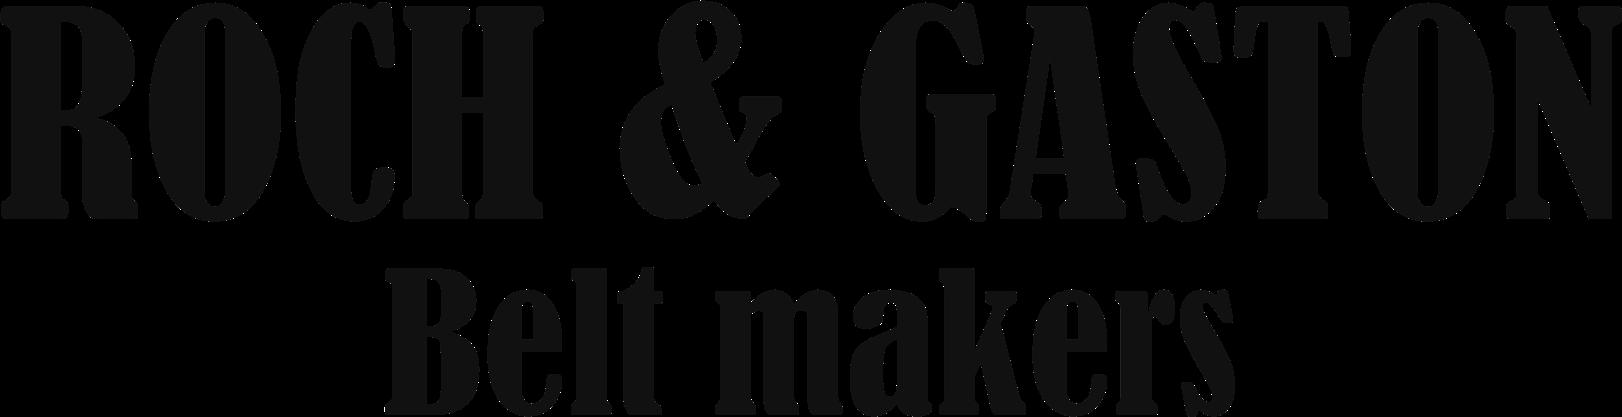 logo-sans-image.png